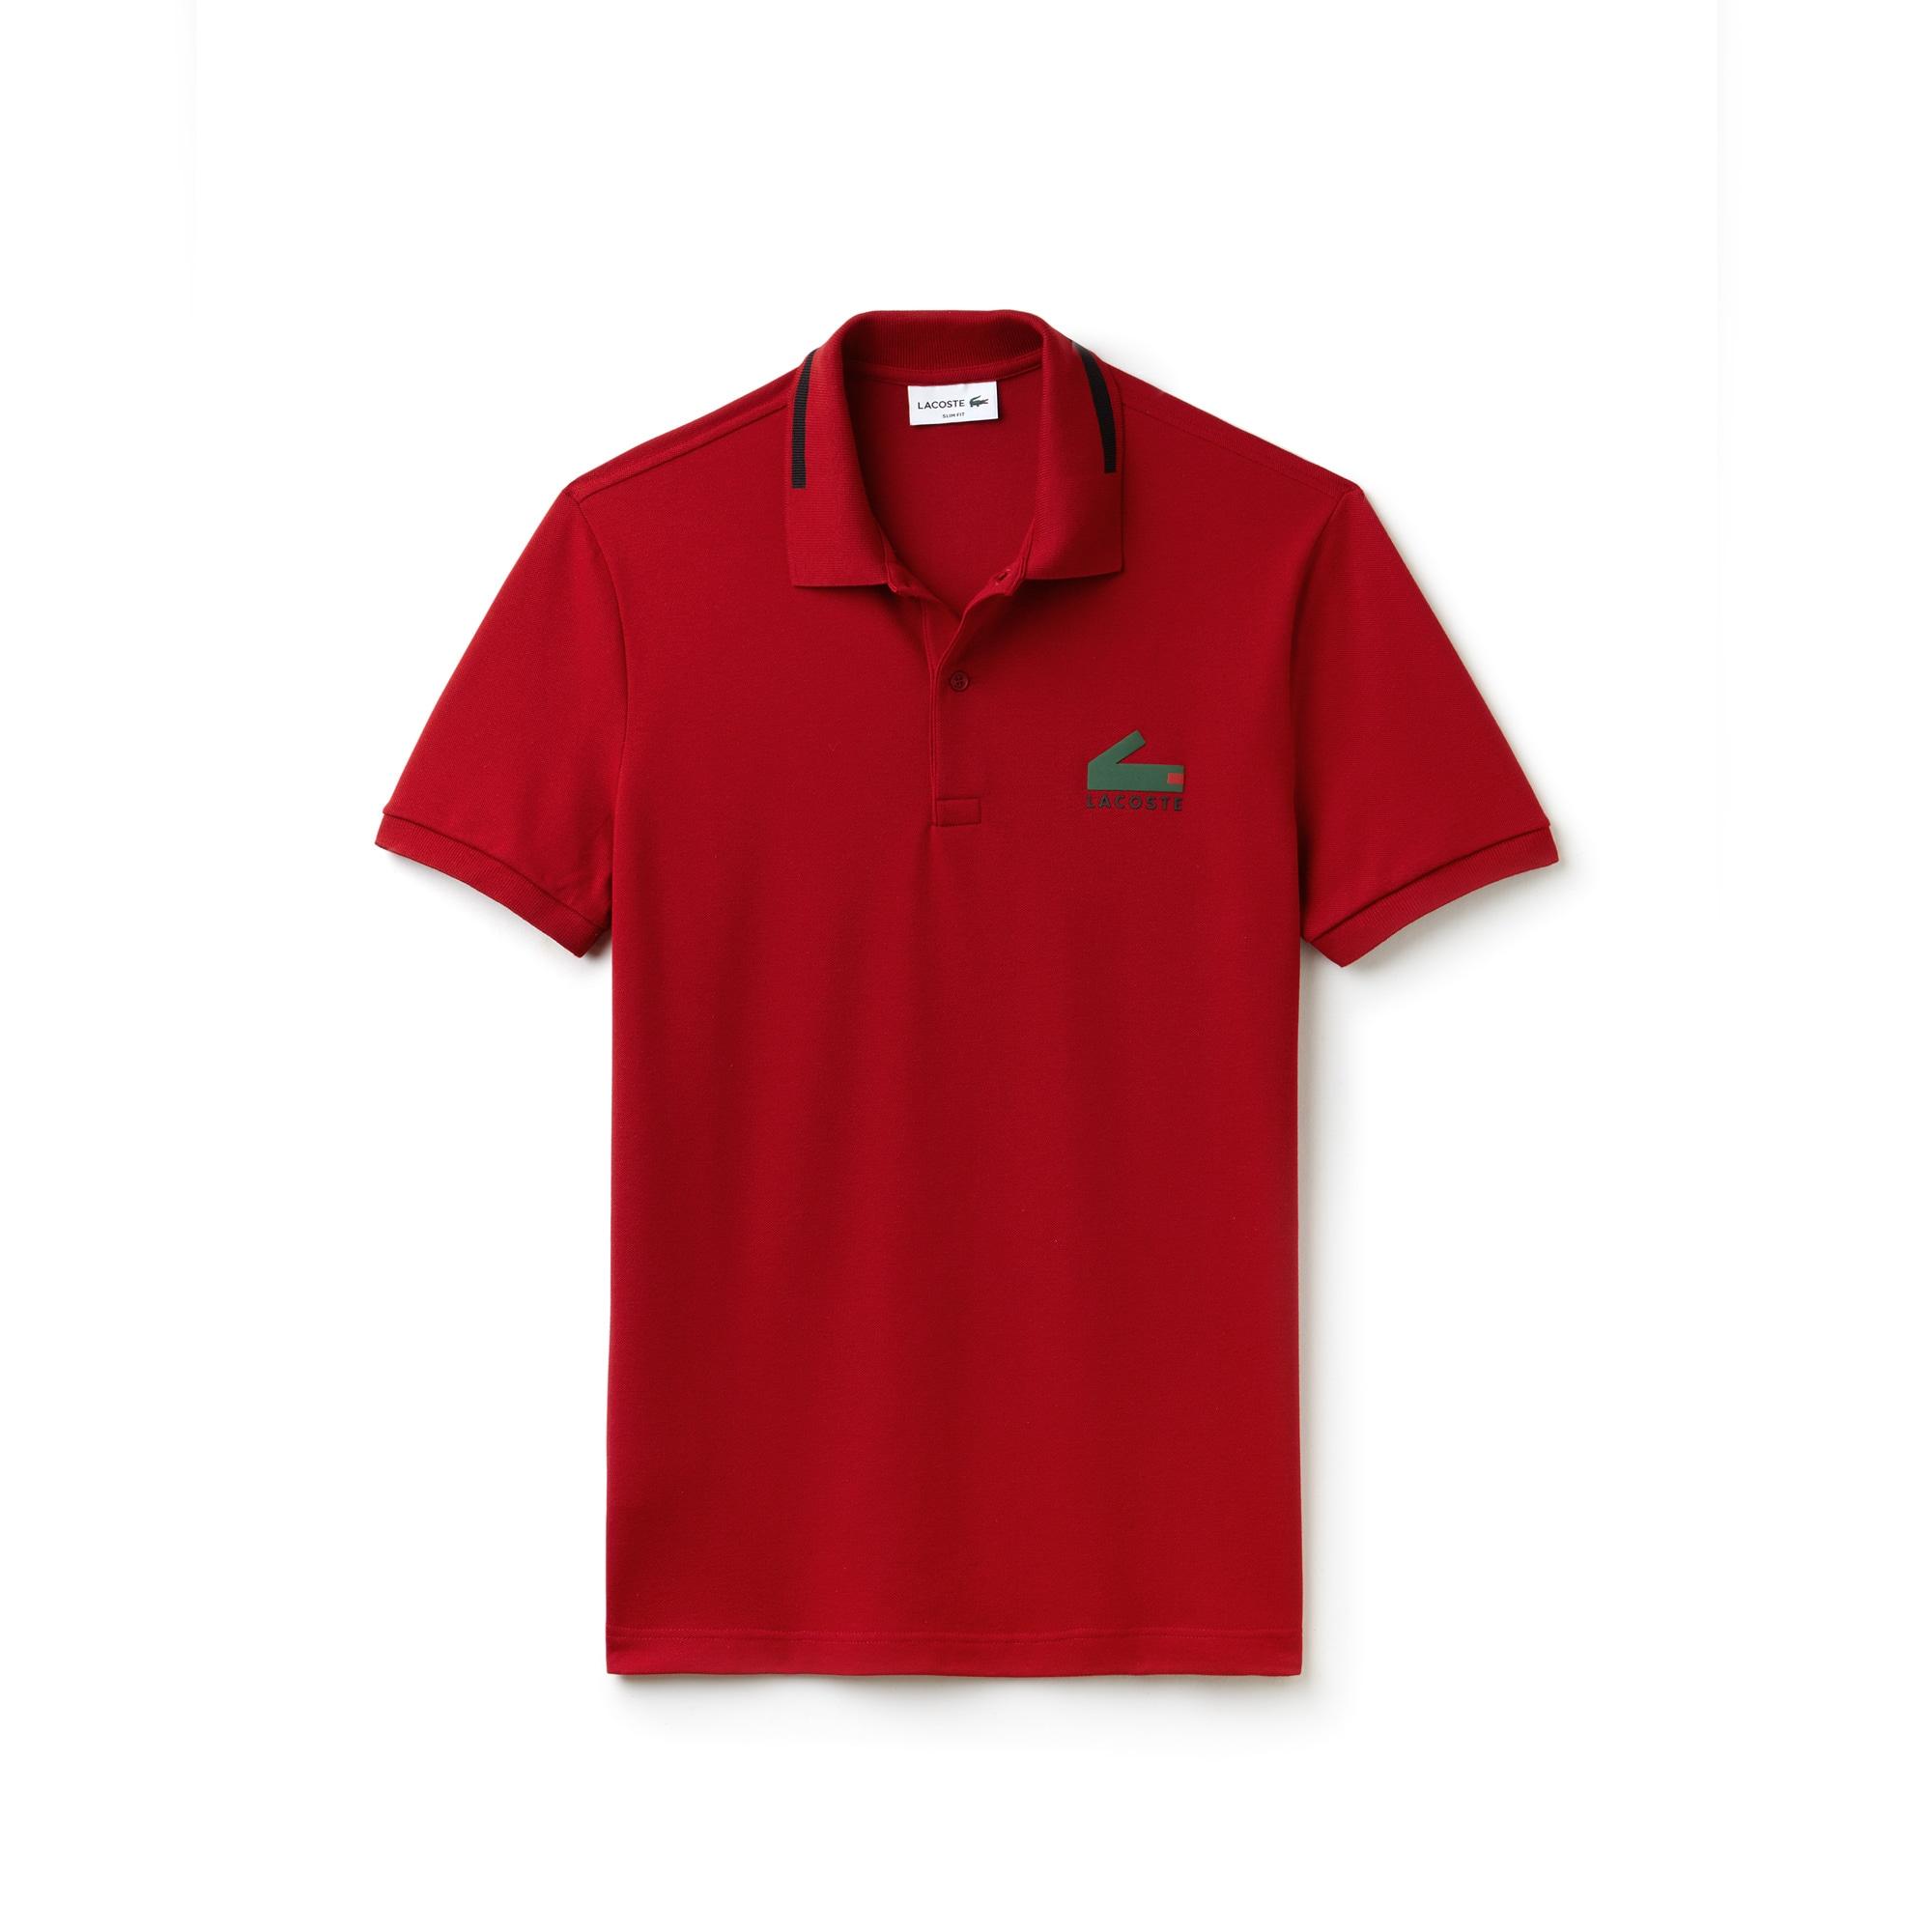 Men's Lacoste Slim Fit Graphic Print Stretch Mini Piqué Polo